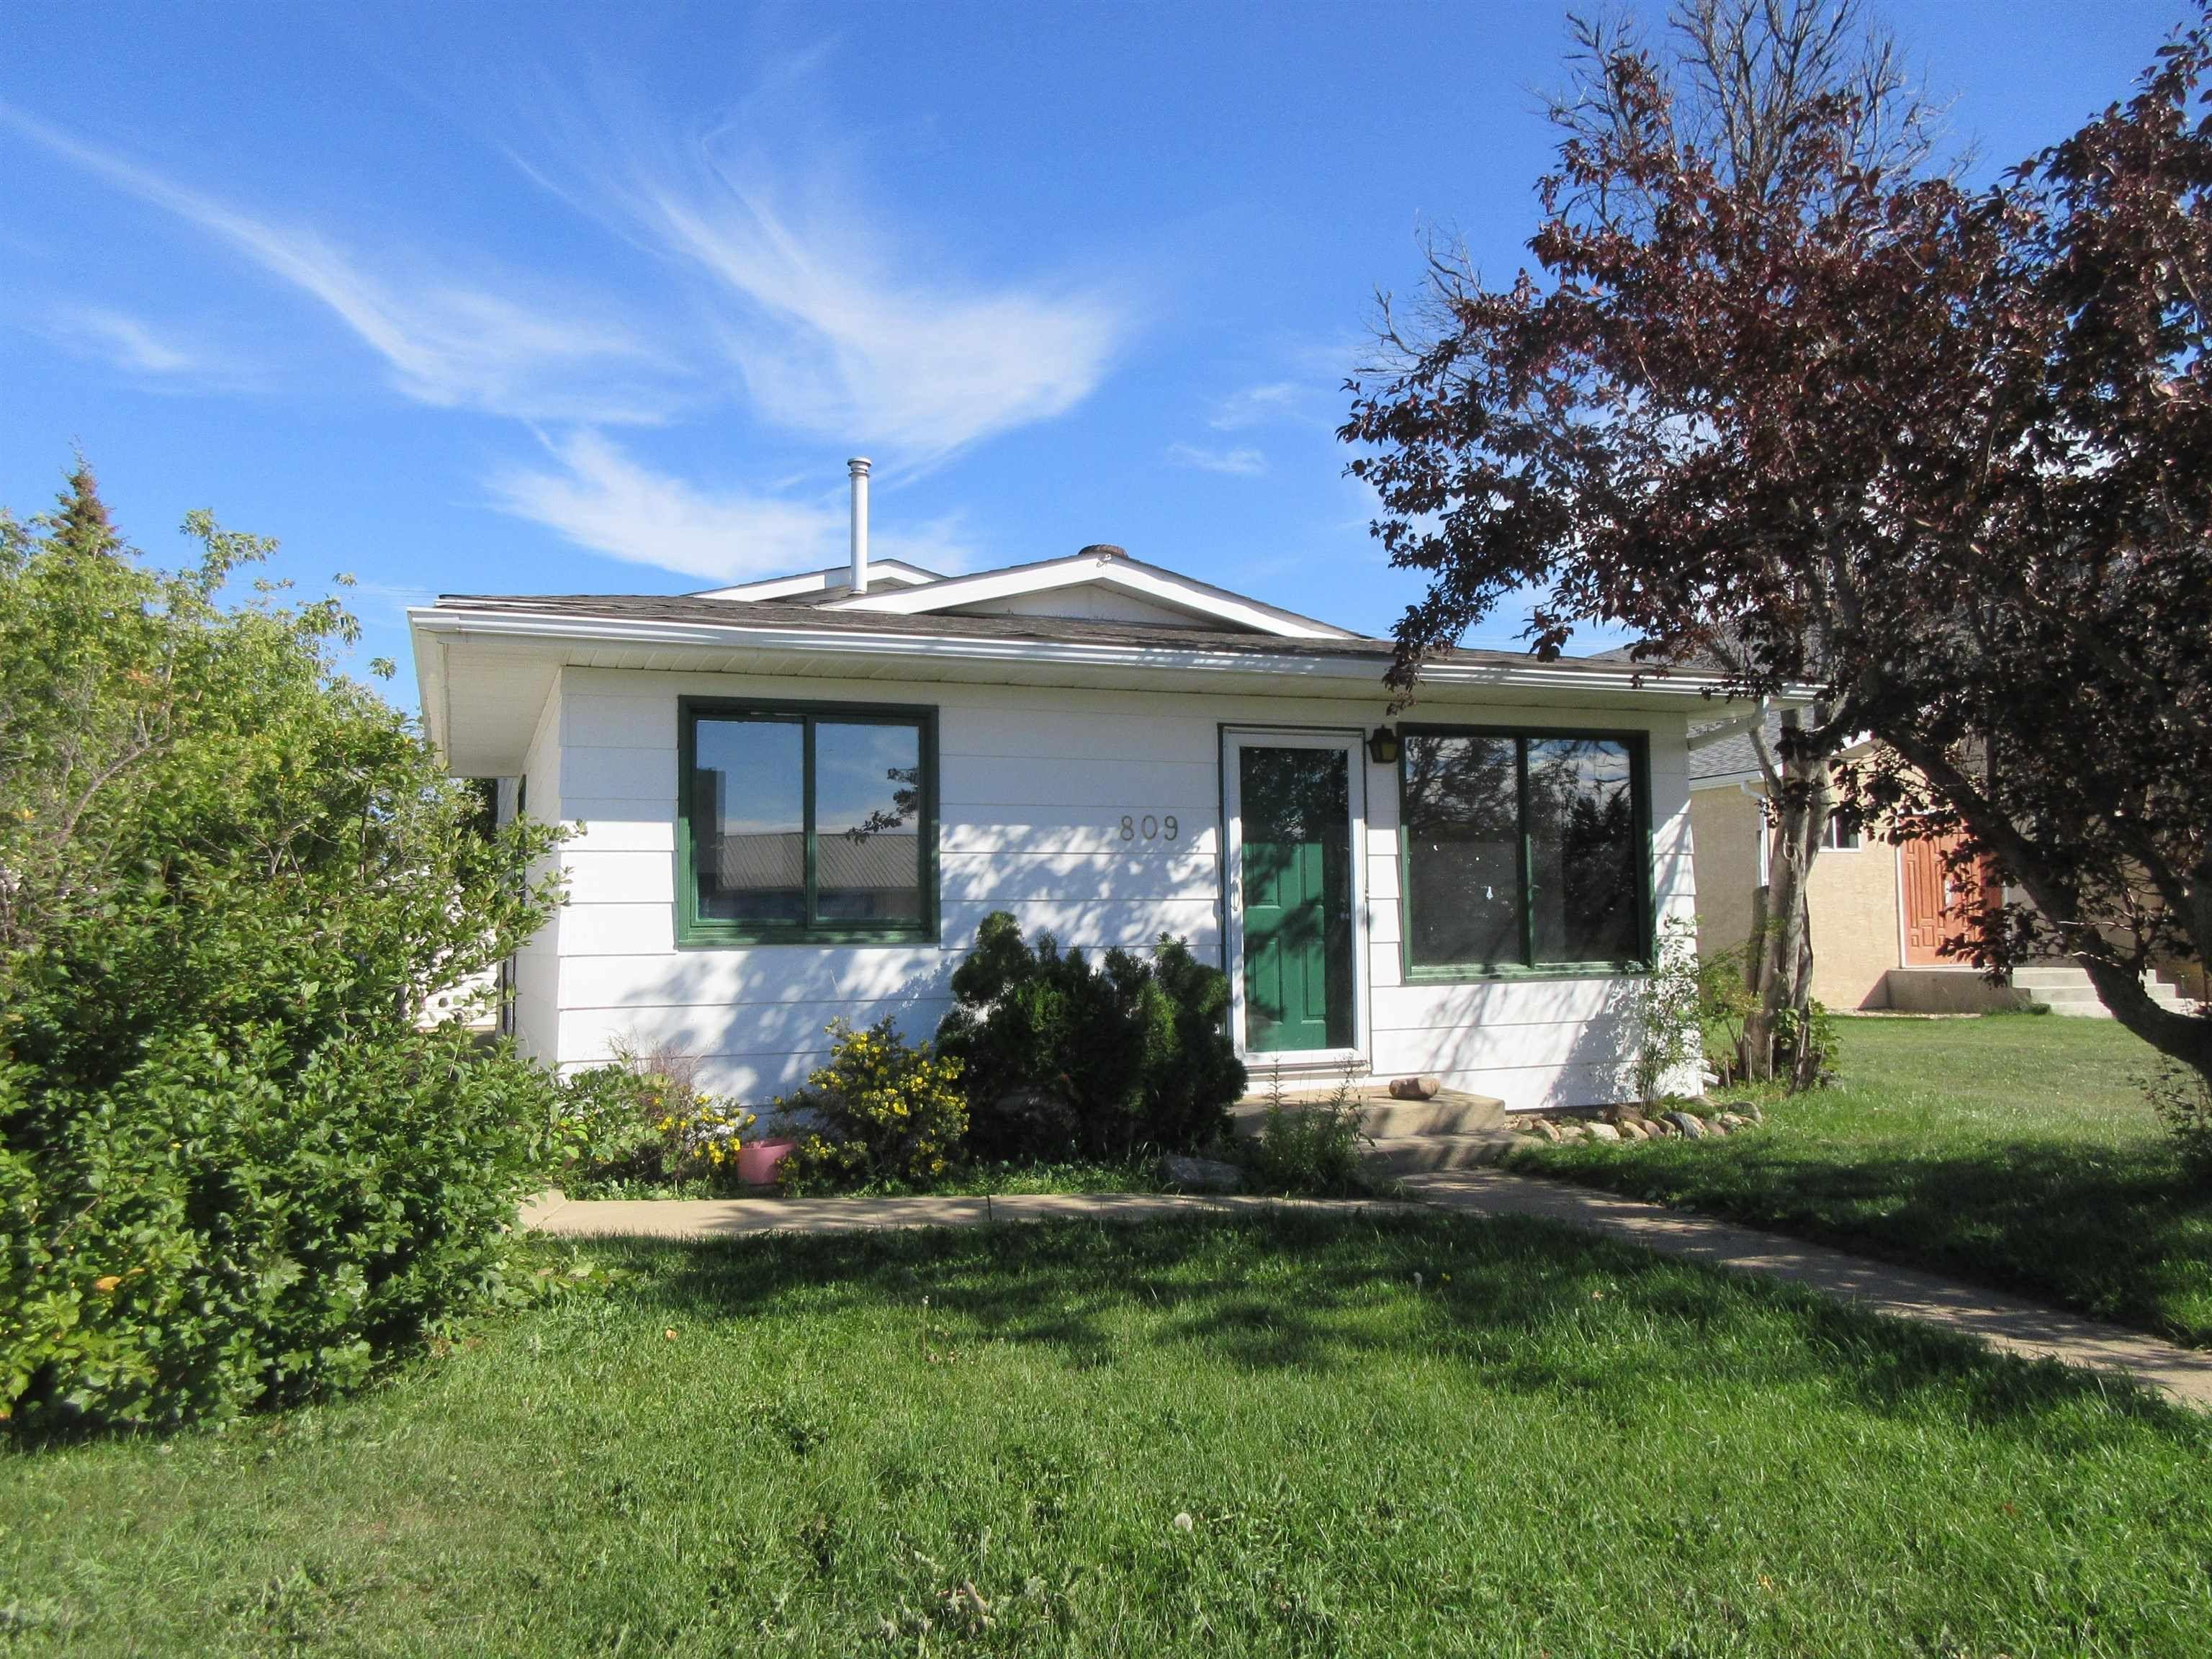 Main Photo: 809 2 Street: Thorhild House for sale : MLS®# E4262355